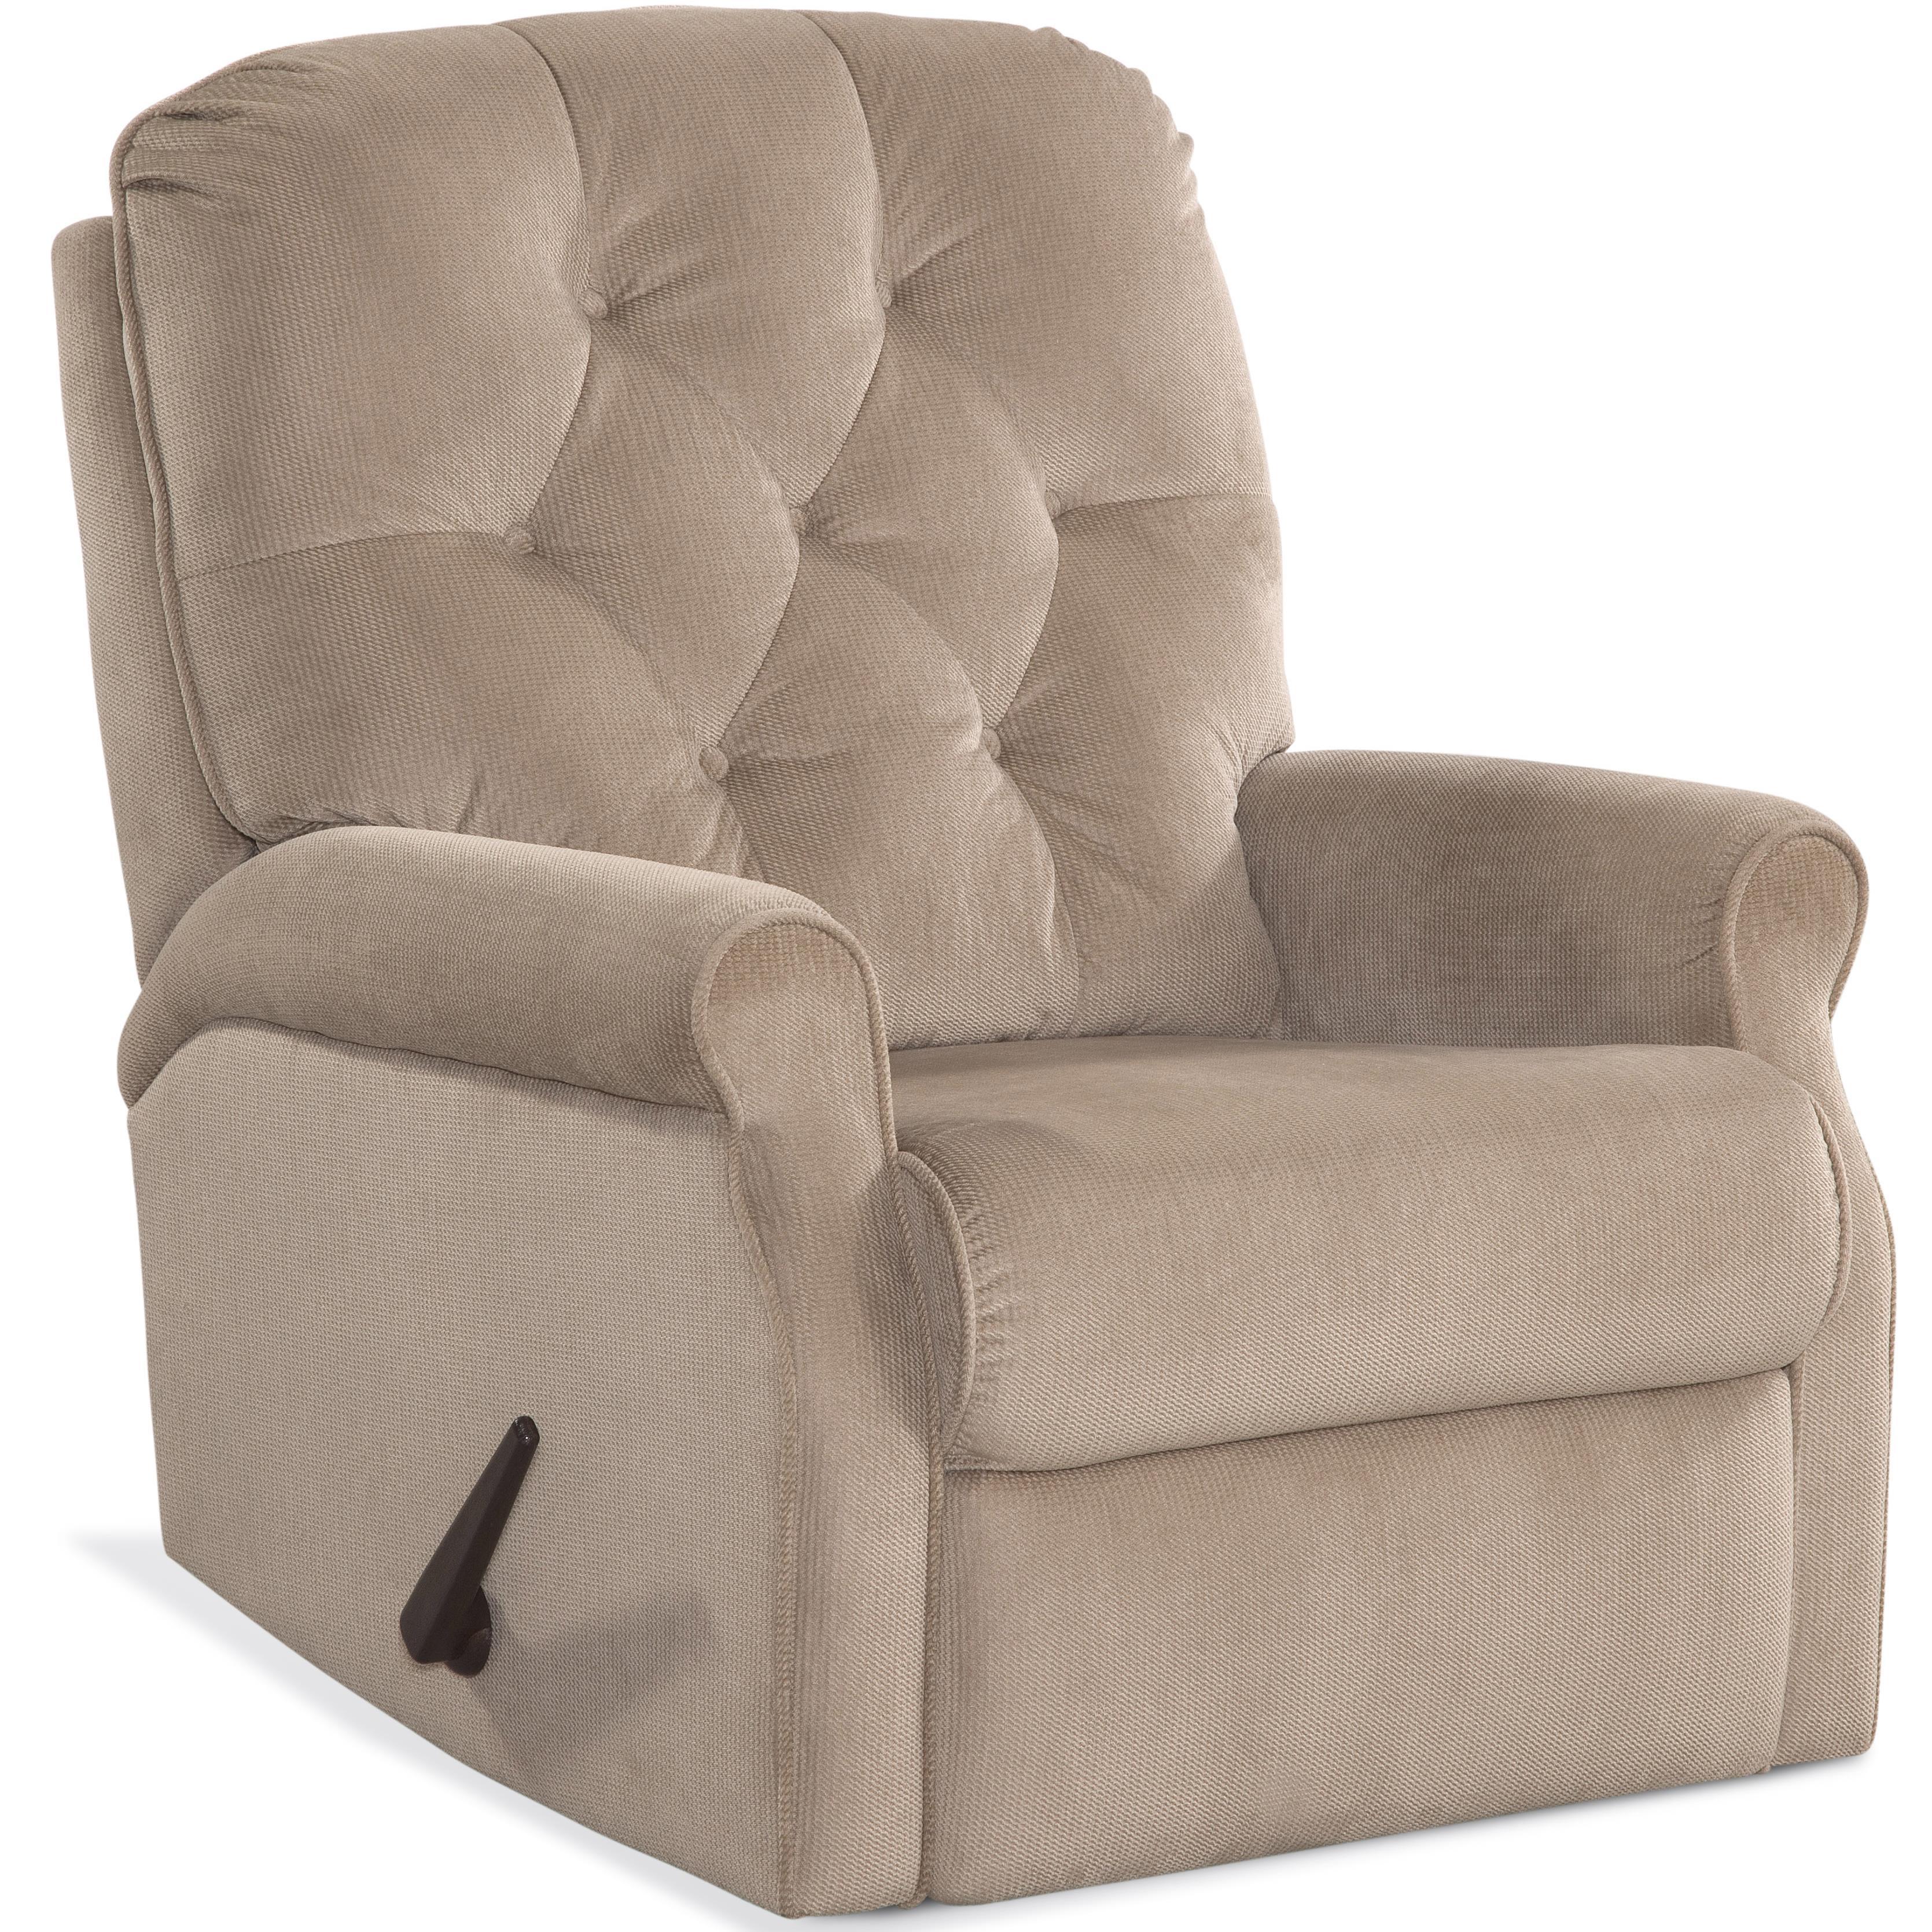 Comfort Living R&R Casual Recliner - Item Number: 127-91-16